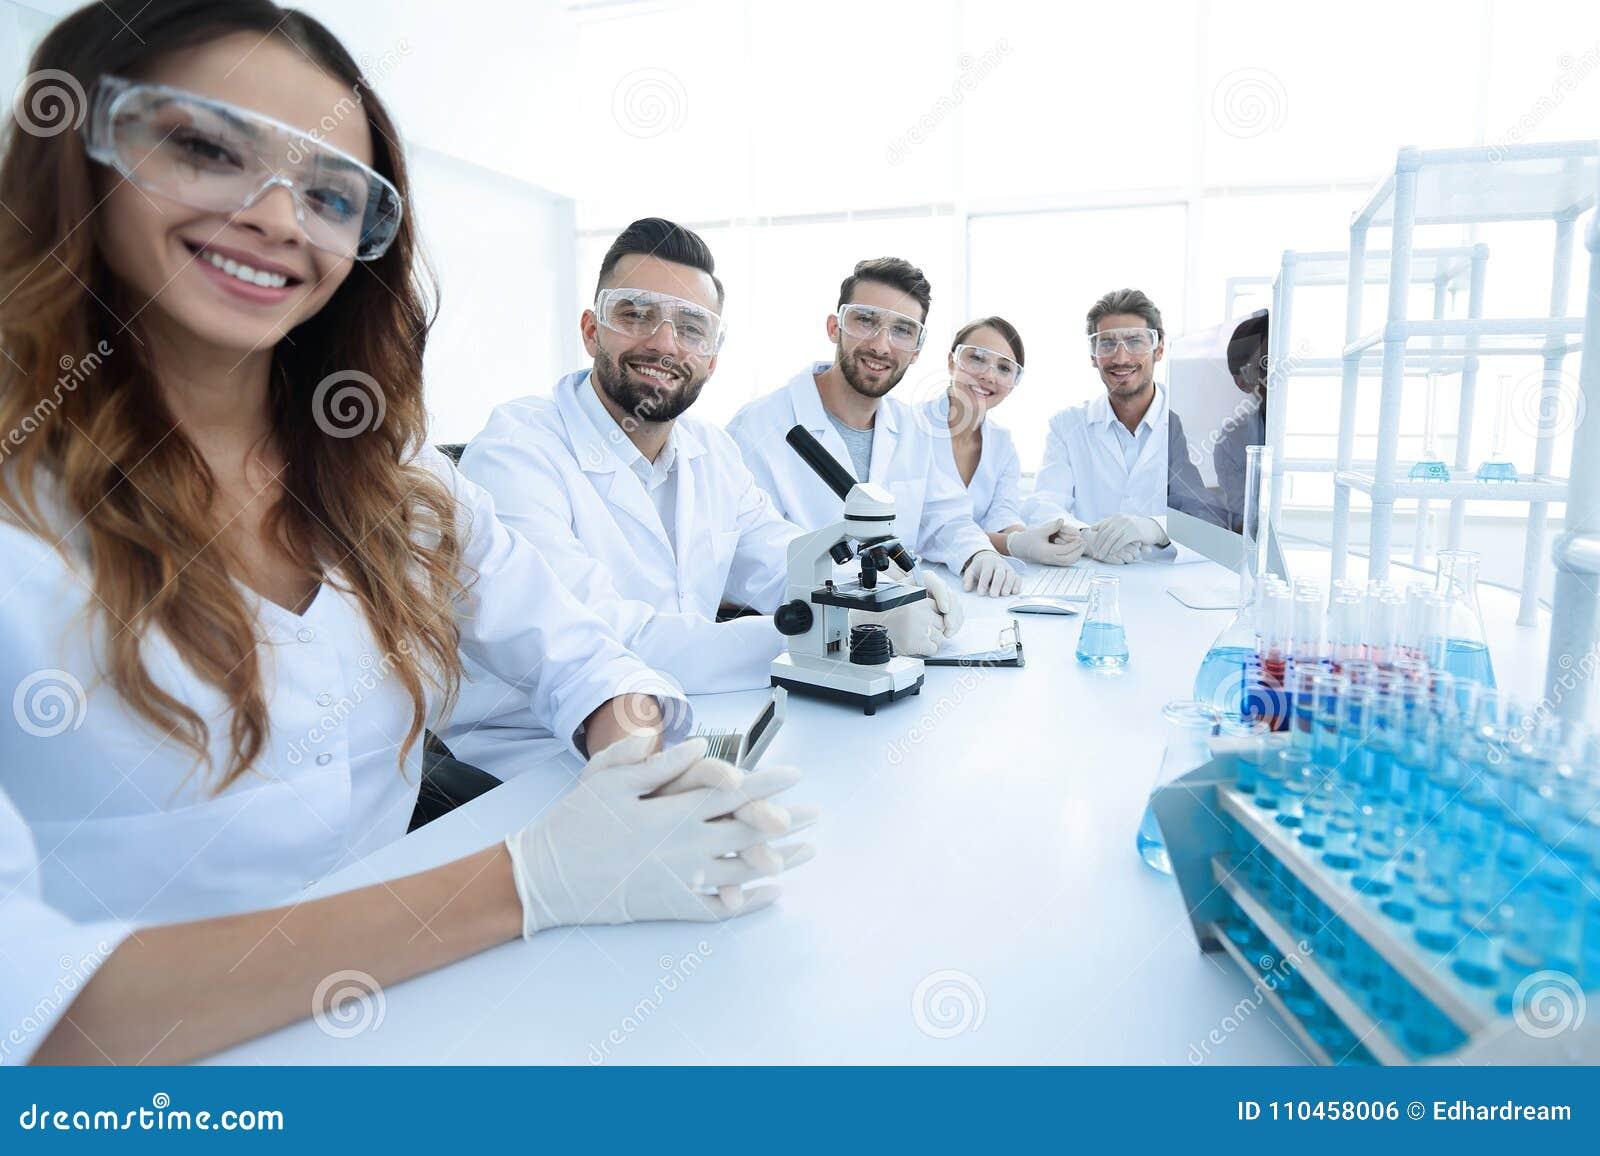 Grupp av ung cliniciansexperimenterande i forskningslaboratorium